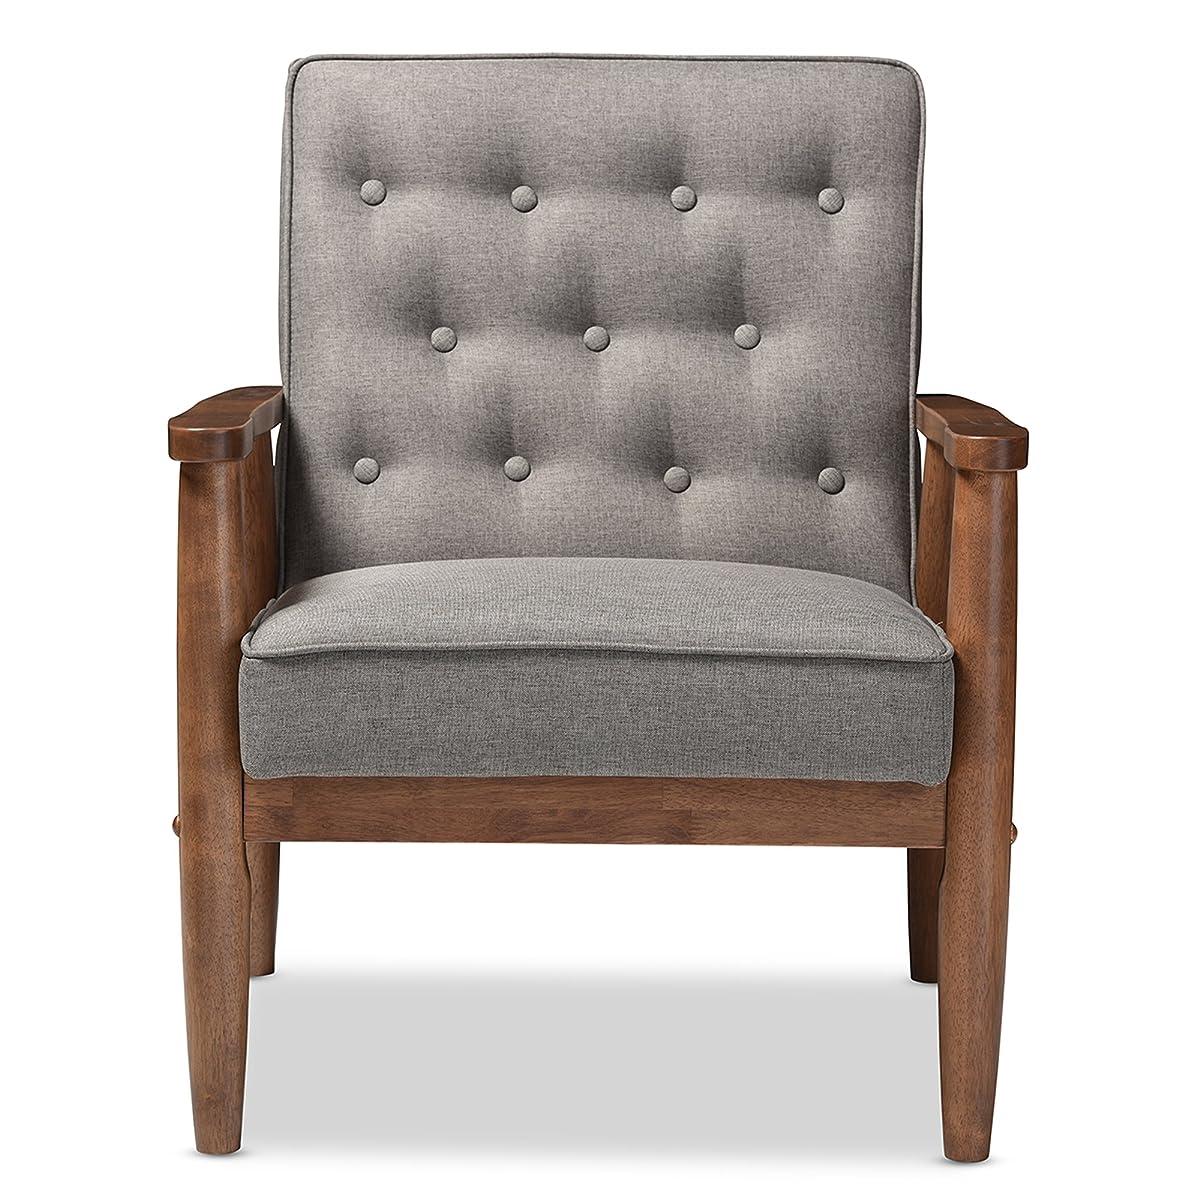 Baxton Studio Sorrento Mid-Century Retro Modern Fabric Upholstered Wooden Lounge Chair, Grey